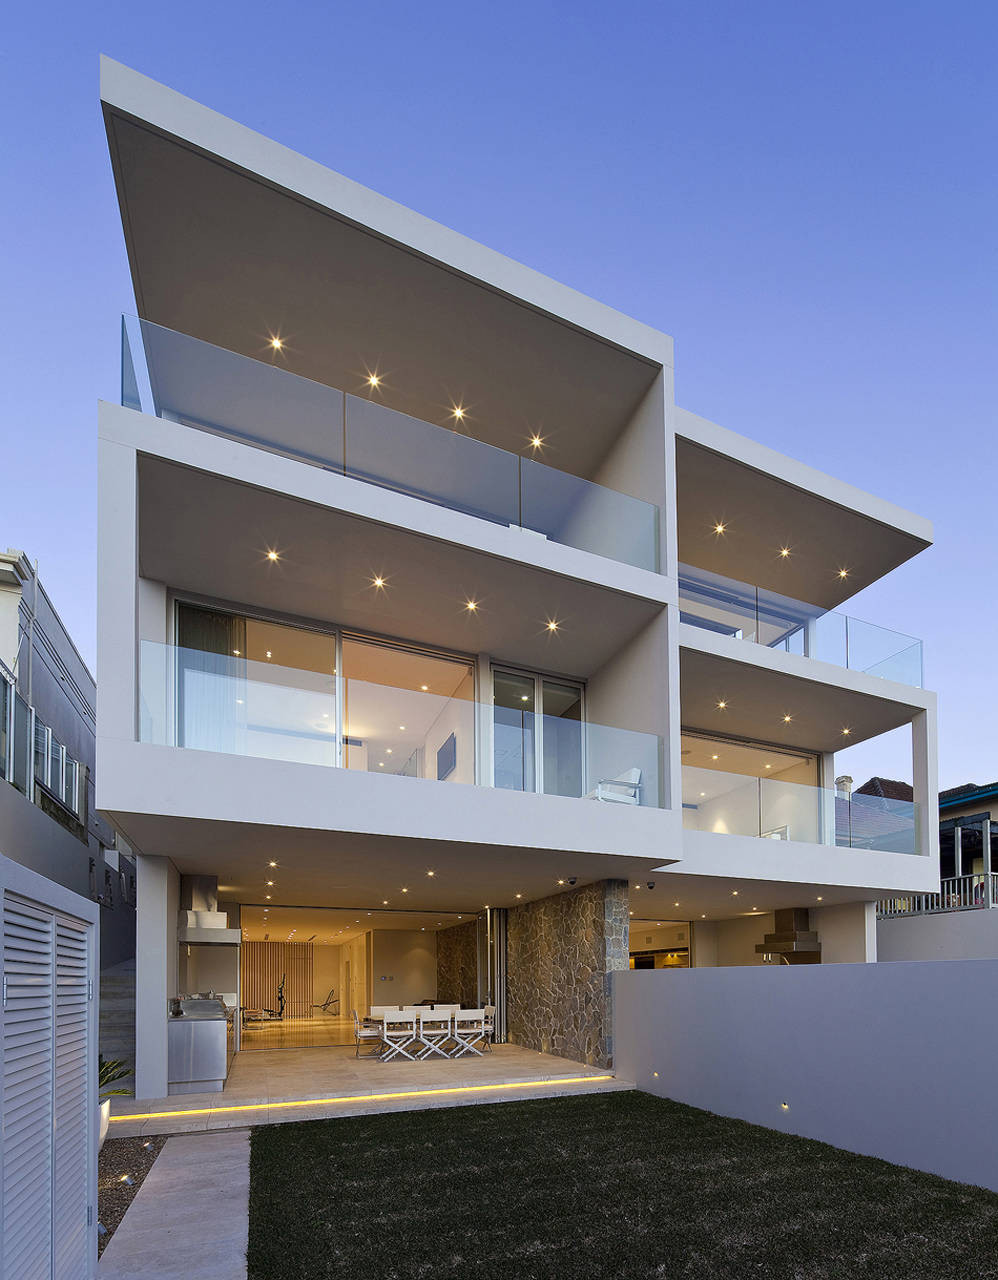 Gallery Of Portland Street Duplex MPR Design Group   Duplex Homes Designs